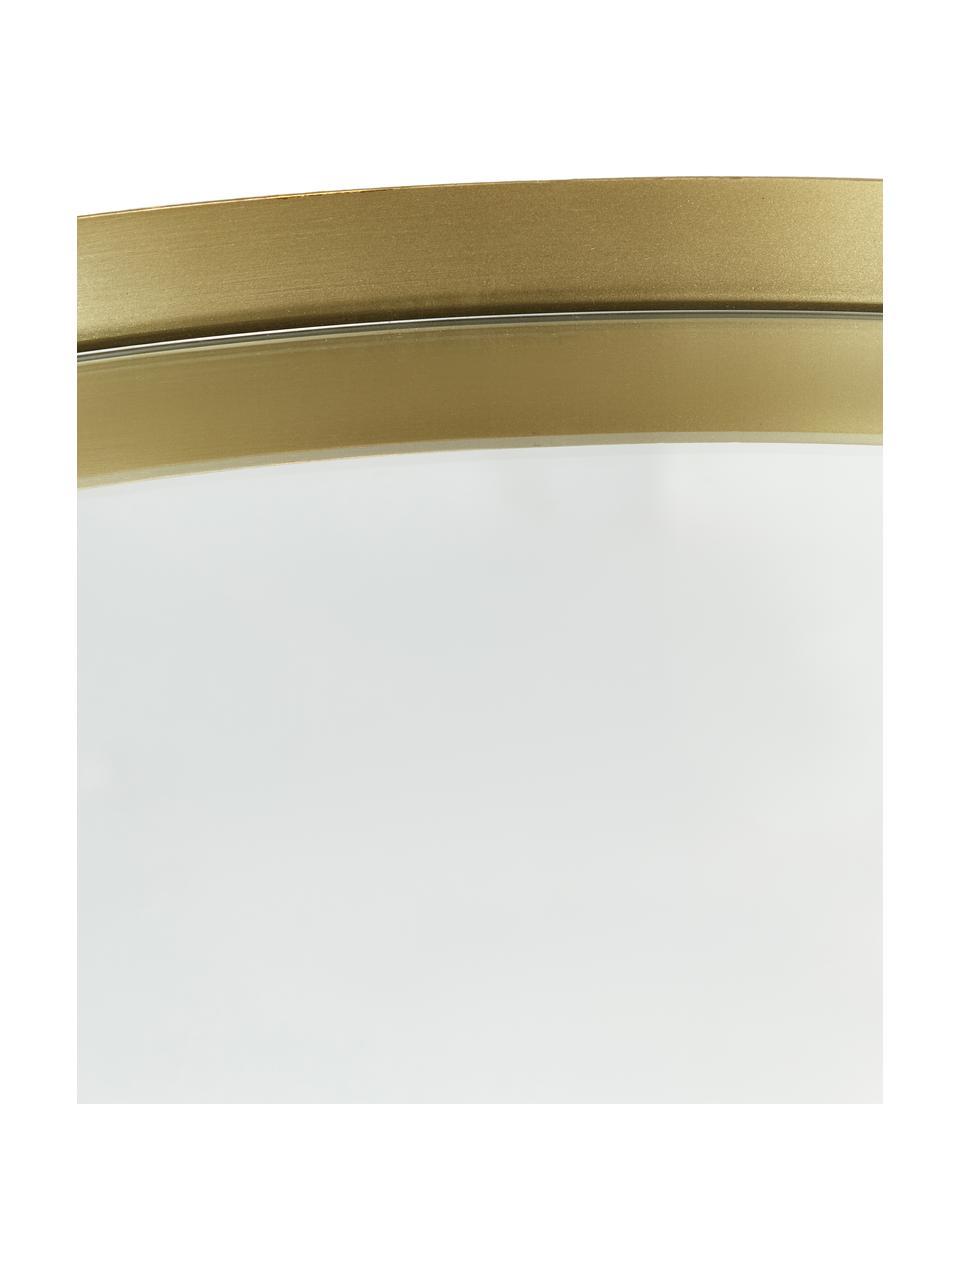 Espejo de pared redondo Ivy, Espejo: cristal, Parte trasera: tablero de fibras de dens, Latón, Ø 72 cm